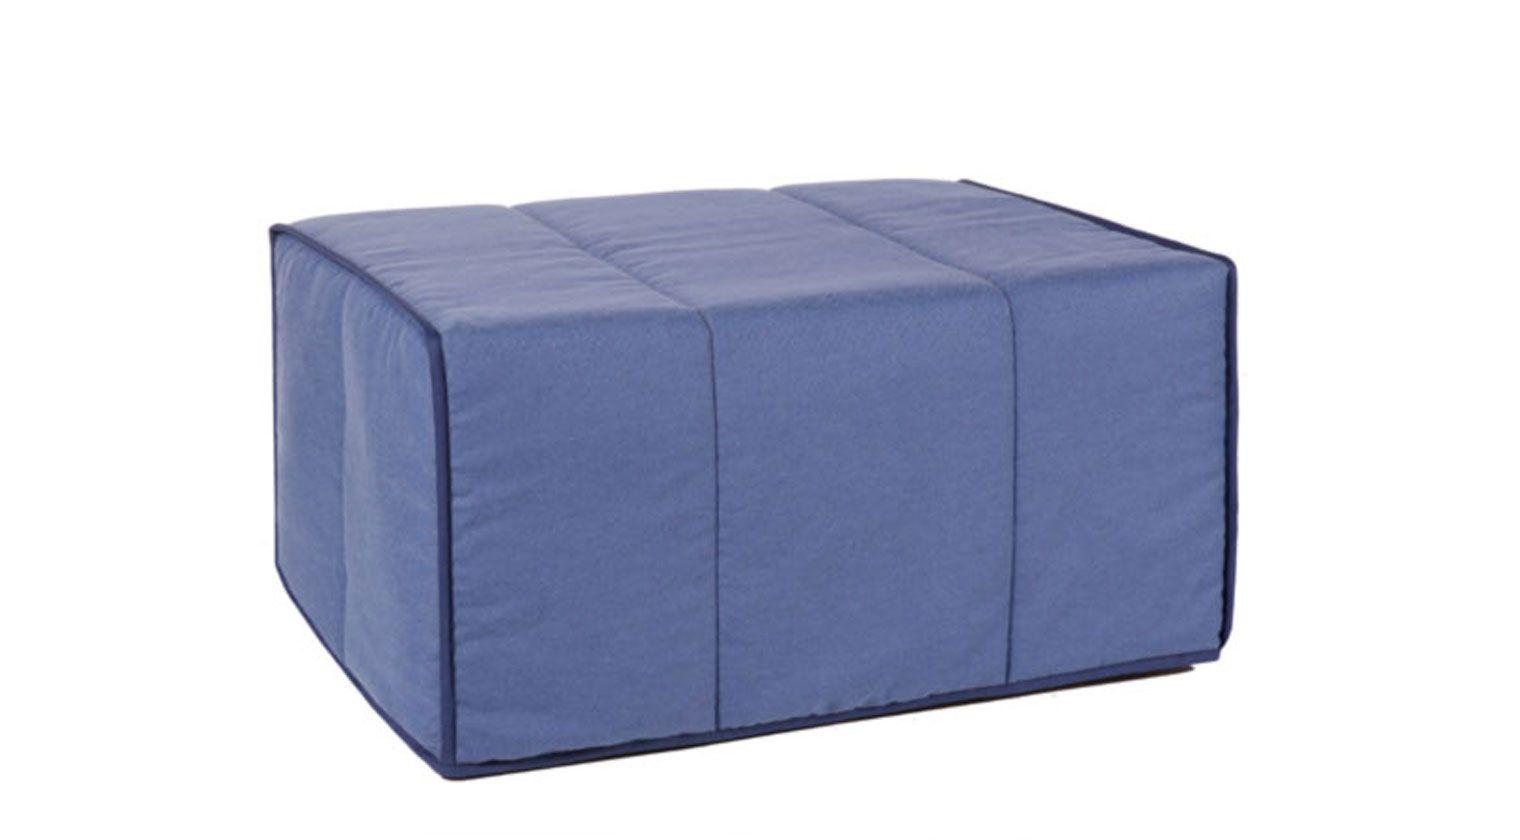 Puff cama 80 pouffs interiores - Puff convertible cama ...